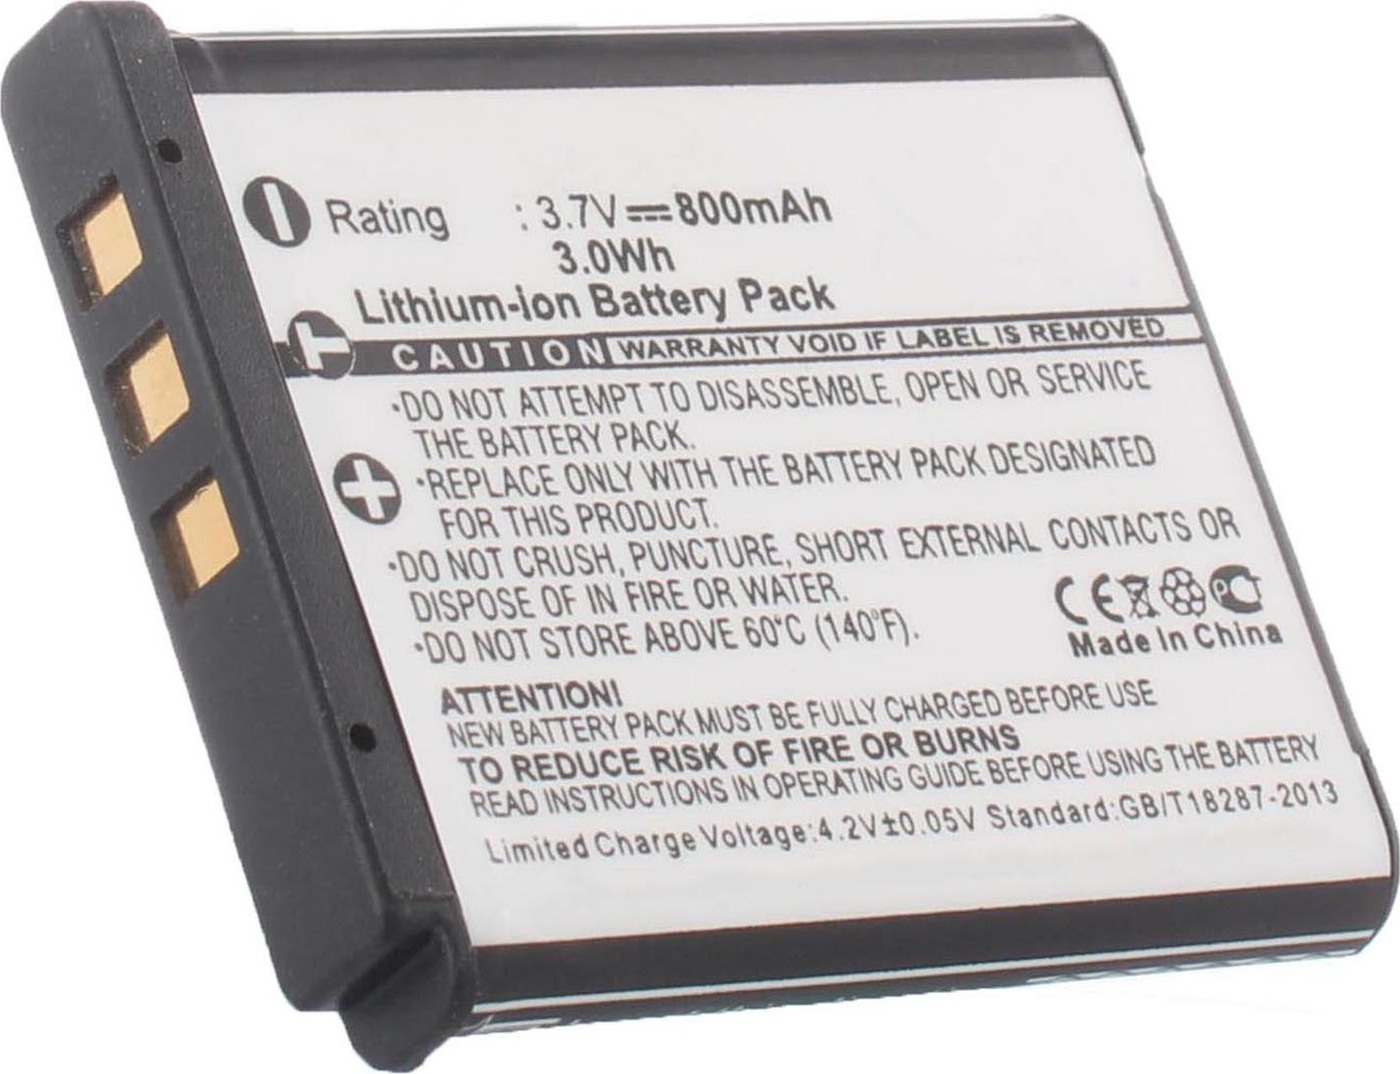 Аккумуляторная батарея iBatt iB-T2-F398 800mAh для камер FujiFilm FinePix F80EXR, FinePix F300EXR, FinePix F100fd, FinePix F70EXR, FinePix S205EXR,  для Kodak Zi8, Zx5 PlaySport, Zx3 PlaySport, EasyShare V1233, EasyShare V1253, EasyShare M1093 IS,